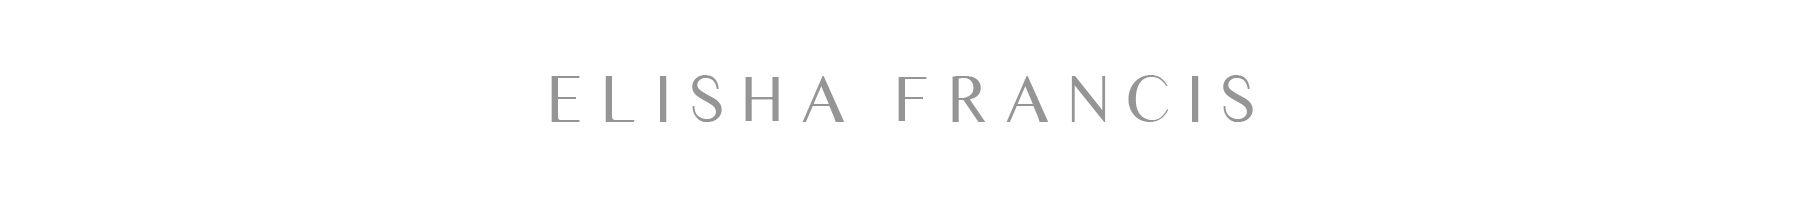 elisha francis logo